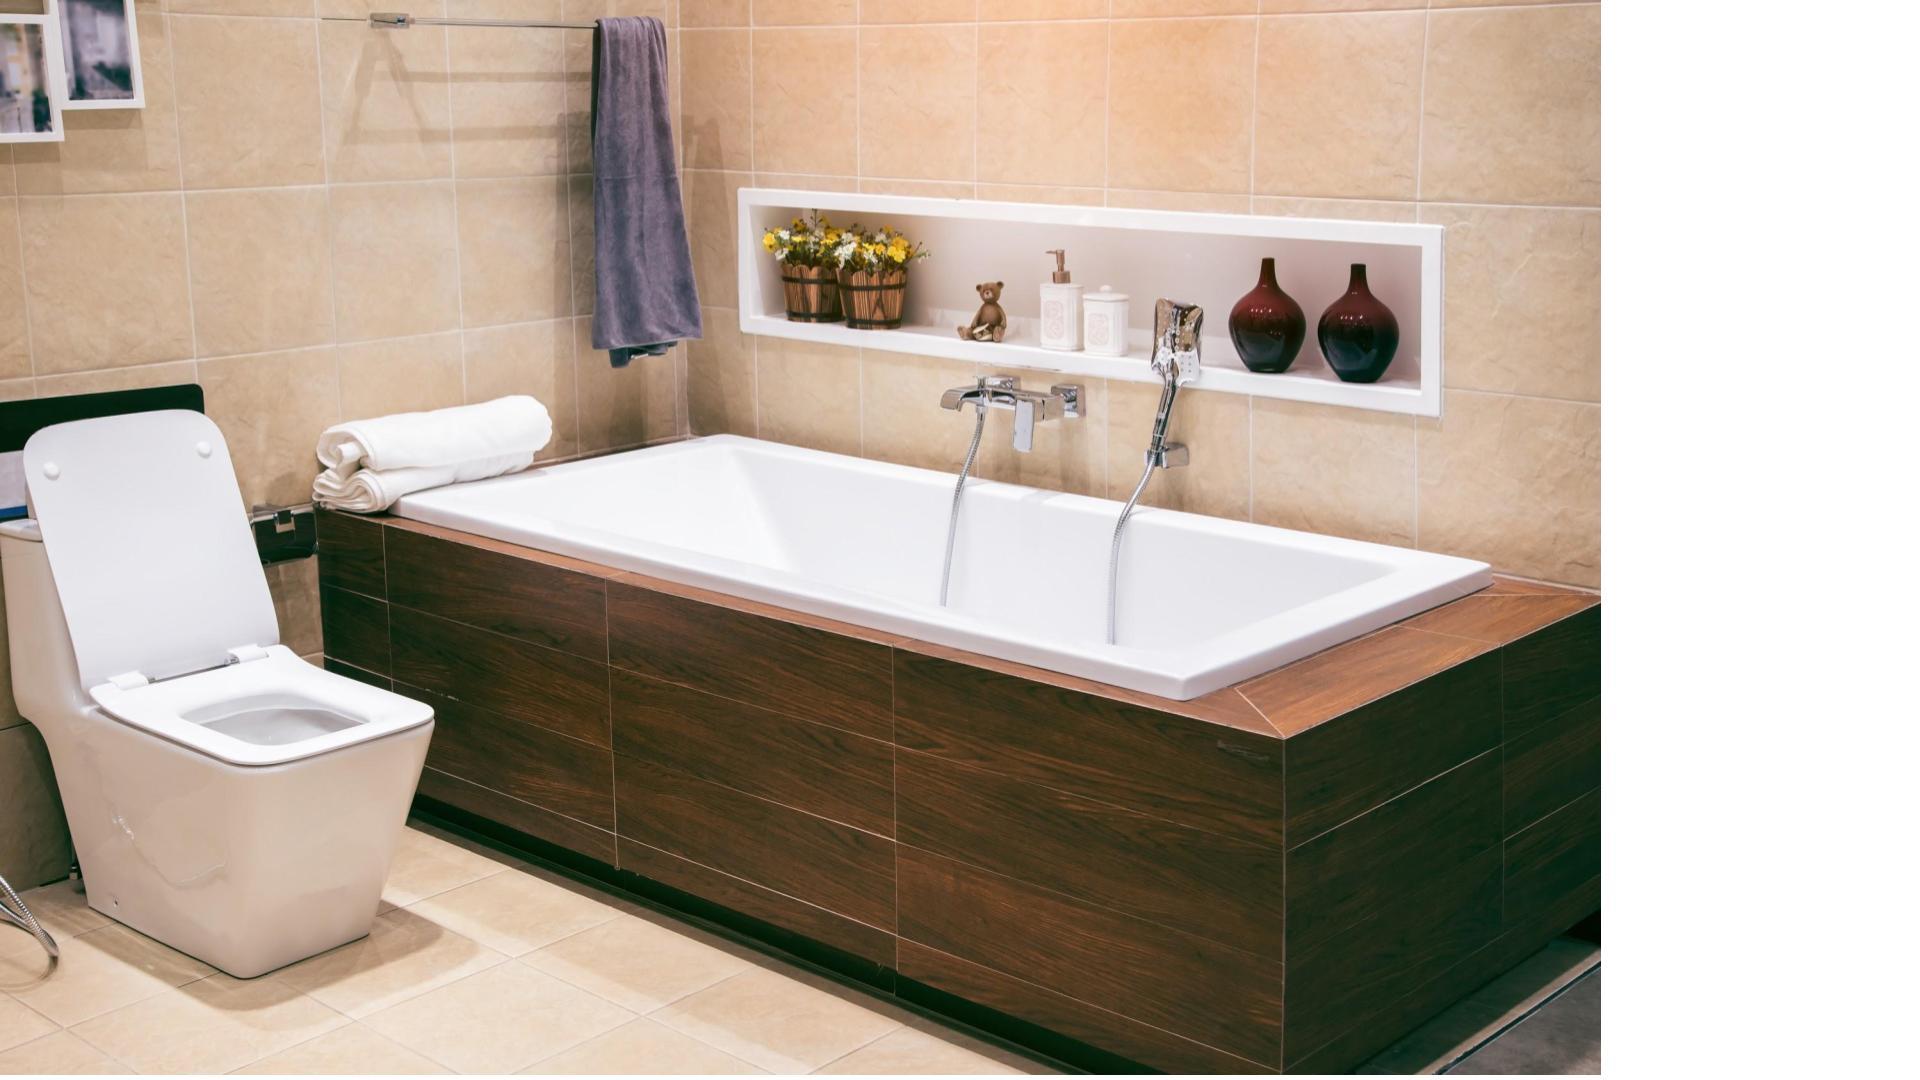 Installation d'un tablier de baignoire